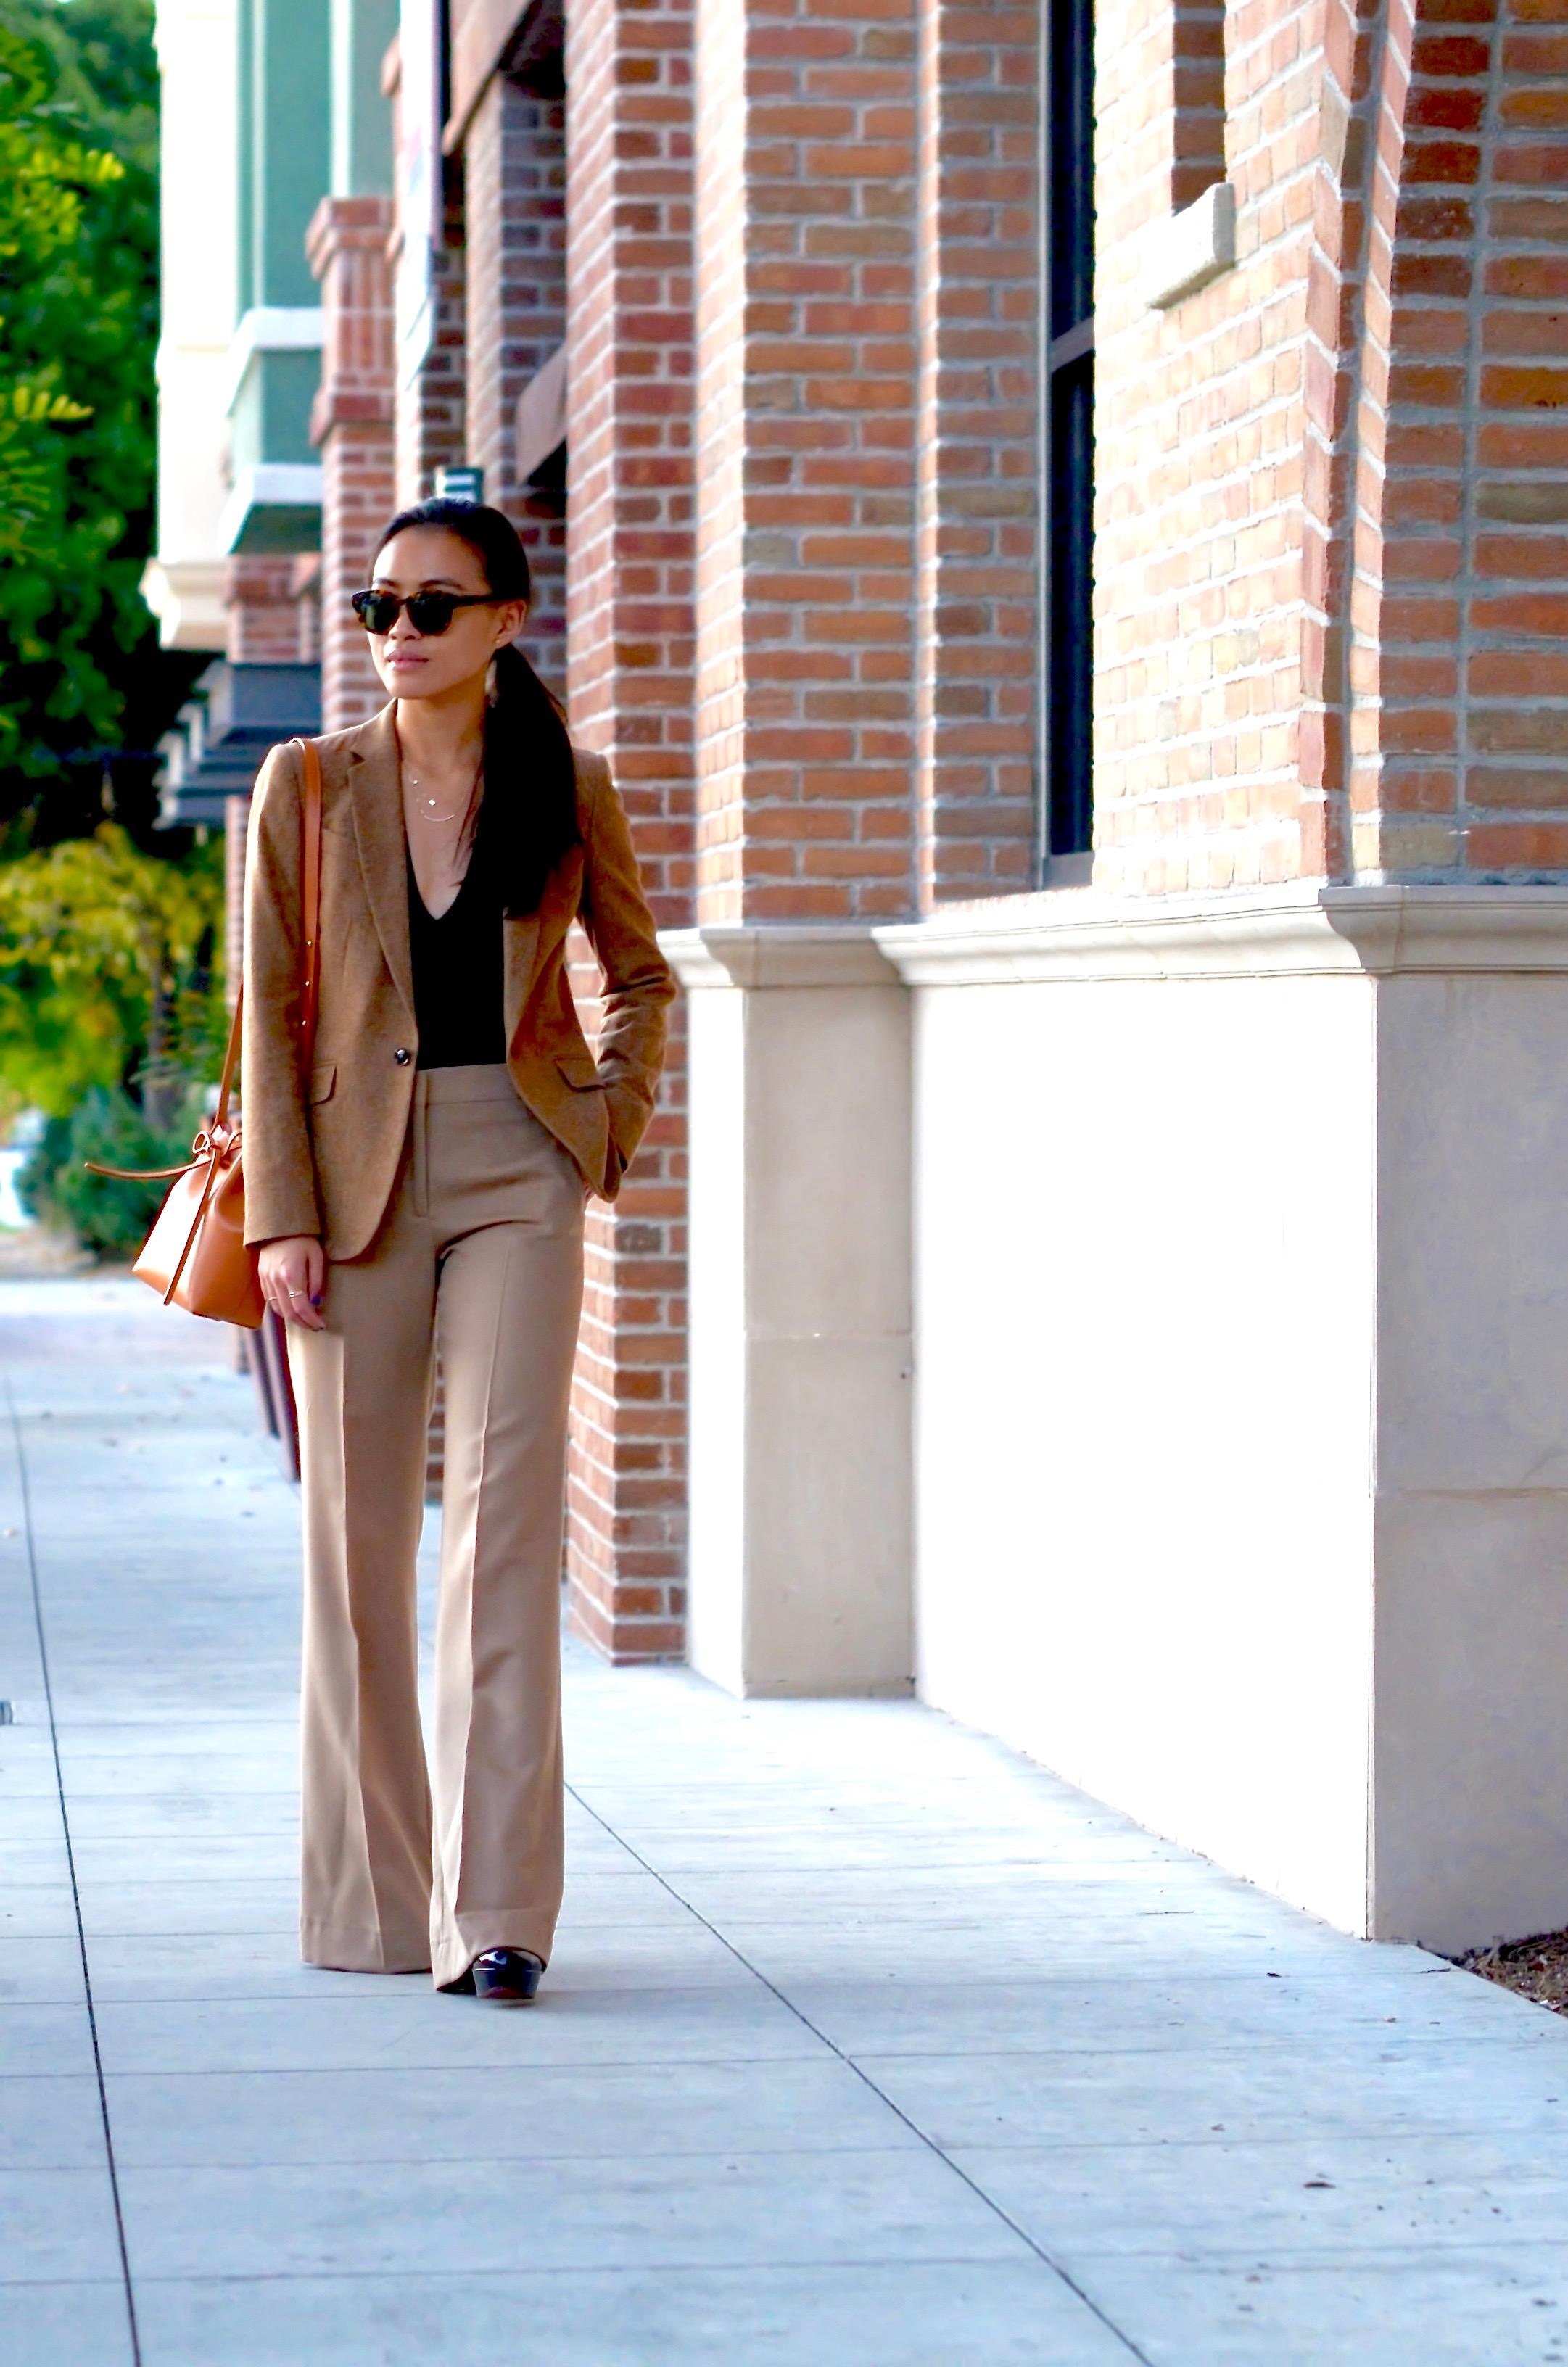 Just Goh With It-Outfit-shopstyle-dressforsuccess-zara-camel-wide-leg-pants-massimo-dutti-blazer-mansur-gavriel-mini-bucket-bag-4.jpg